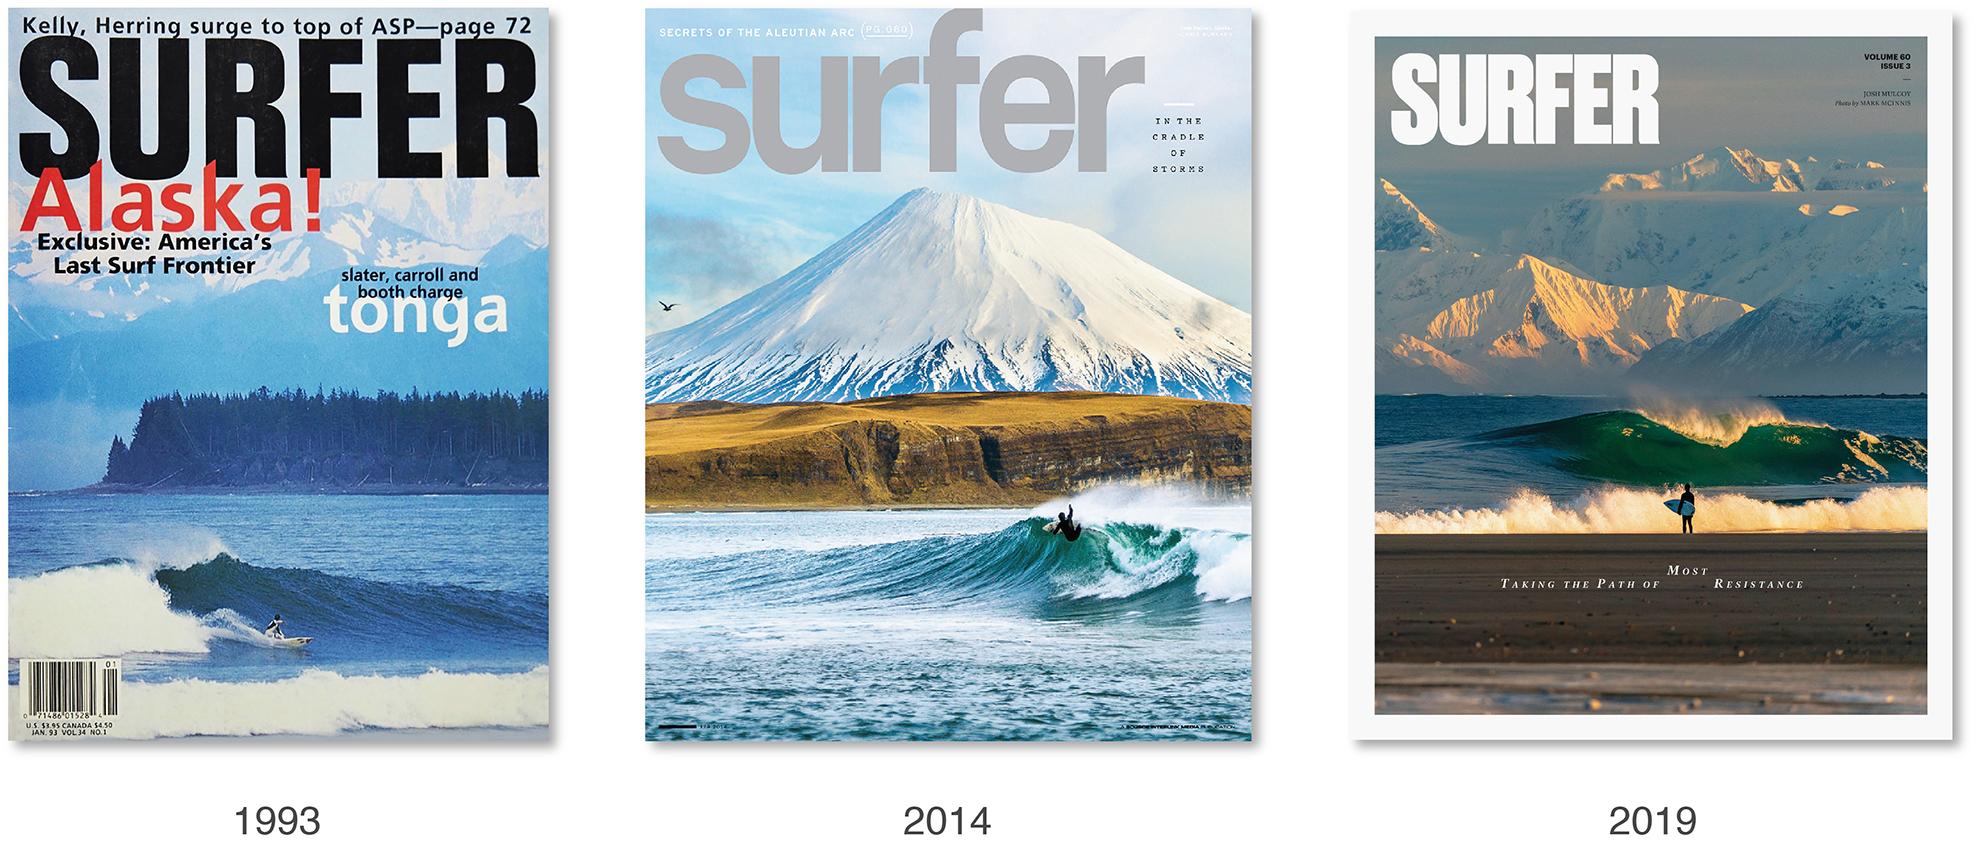 Surfer_Covers_Years_72dpi.jpg